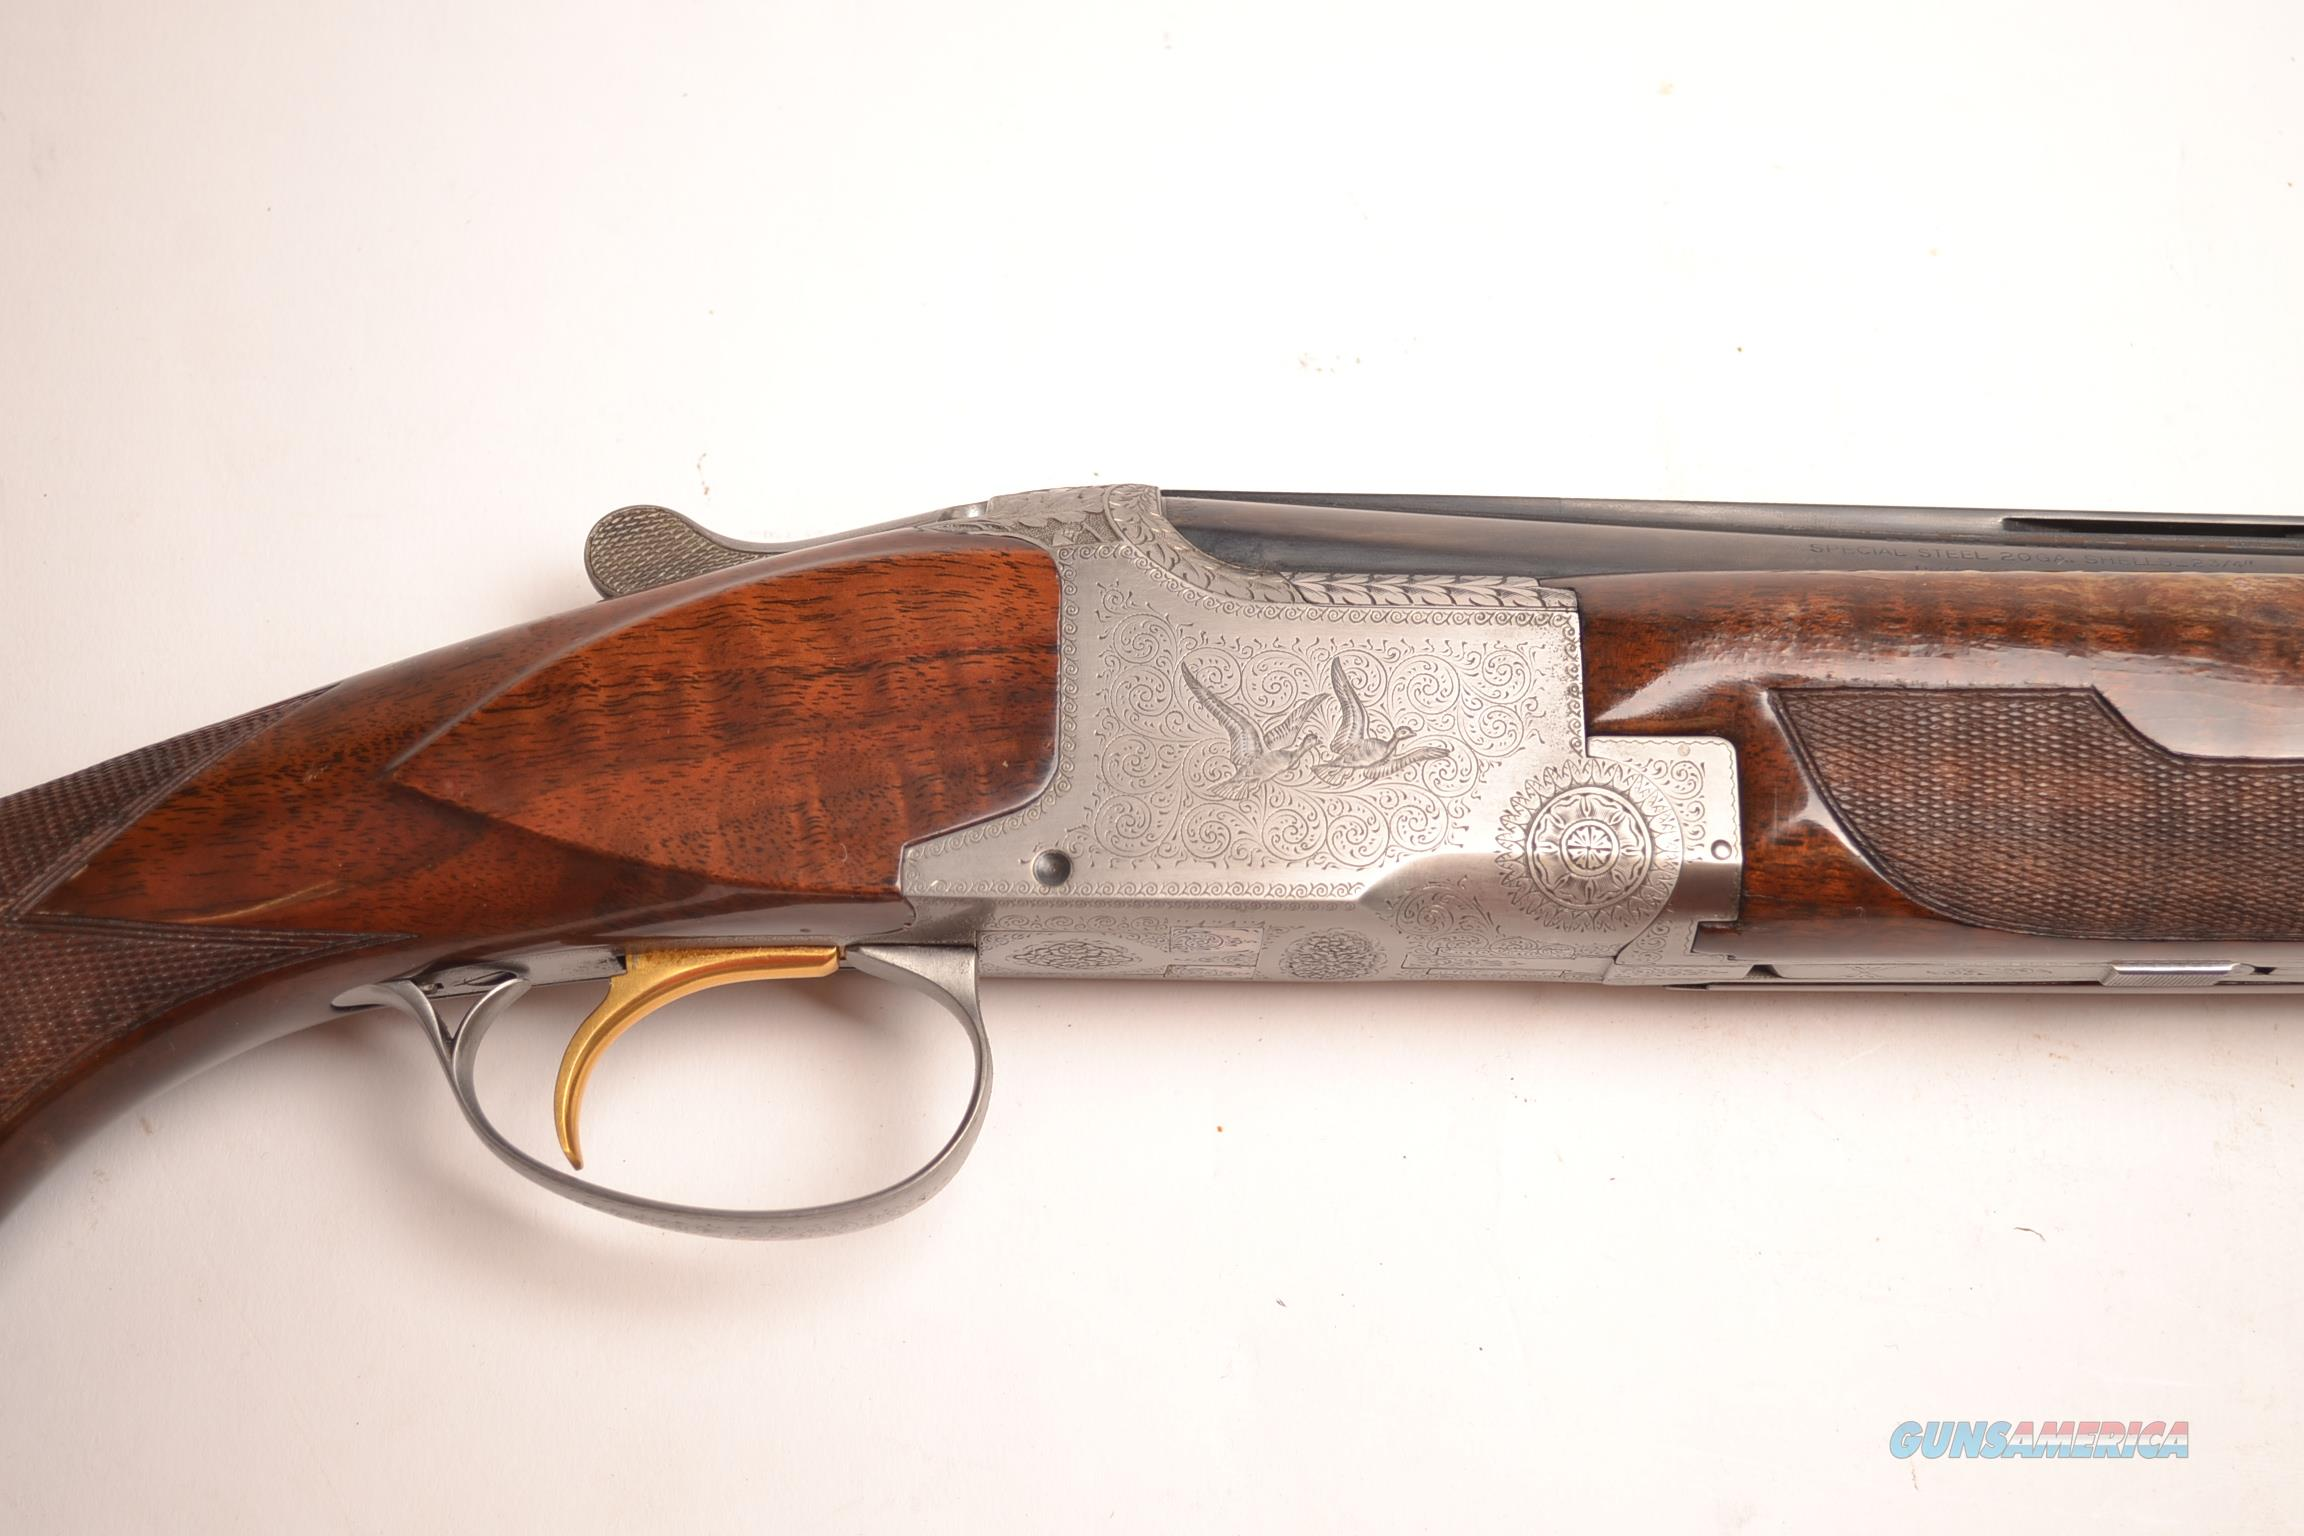 Browning - Superposed Pigeon Grade  Guns > Shotguns > Browning Shotguns > Over Unders > Belgian Manufacture